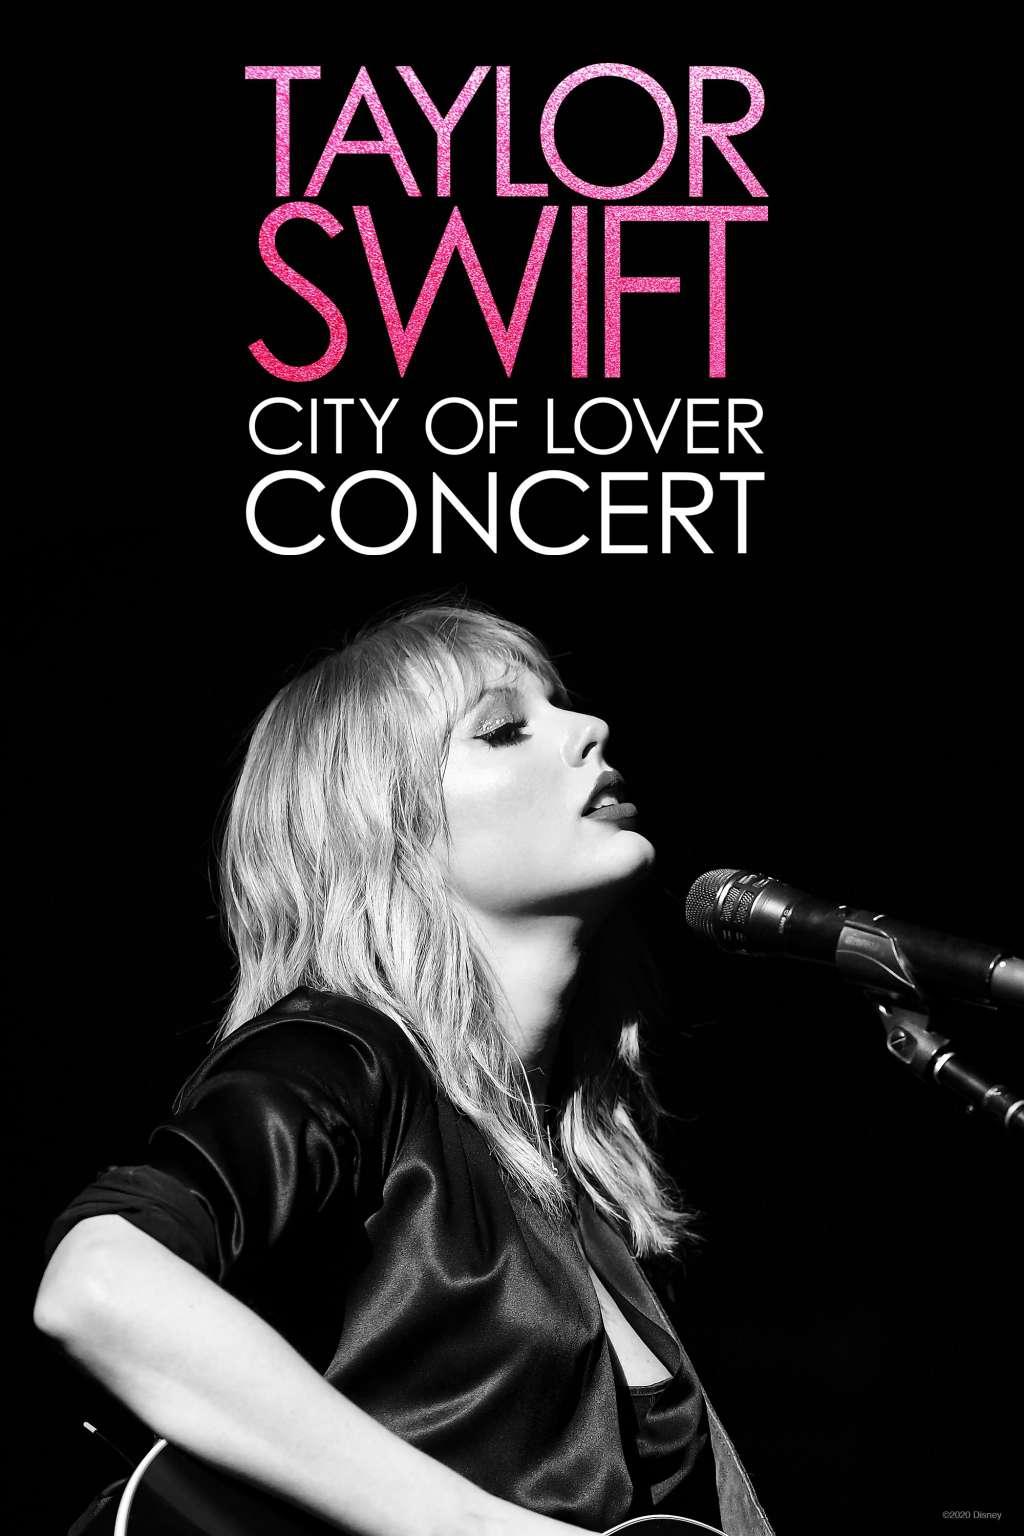 Taylor Swift: City of Lover Concert kapak